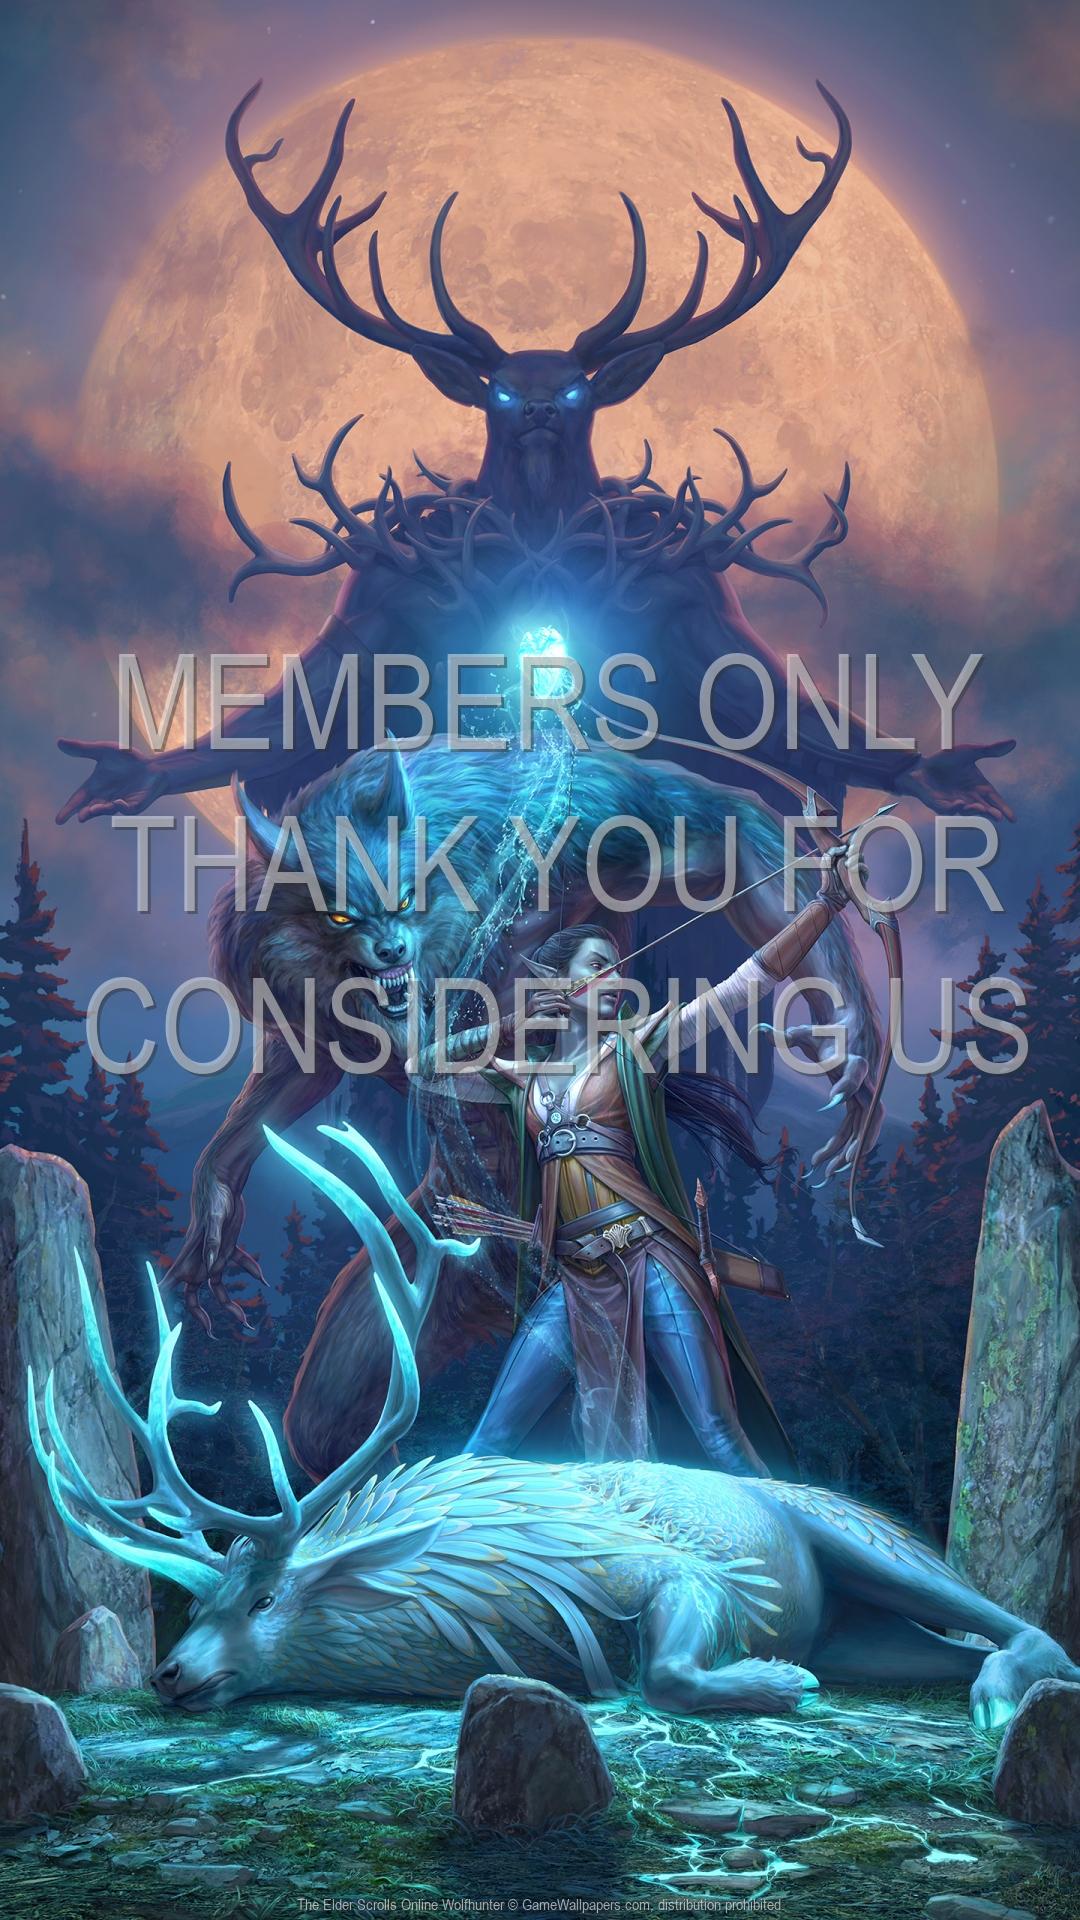 The Elder Scrolls Online: Wolfhunter 1920x1080 Mobile wallpaper or background 01